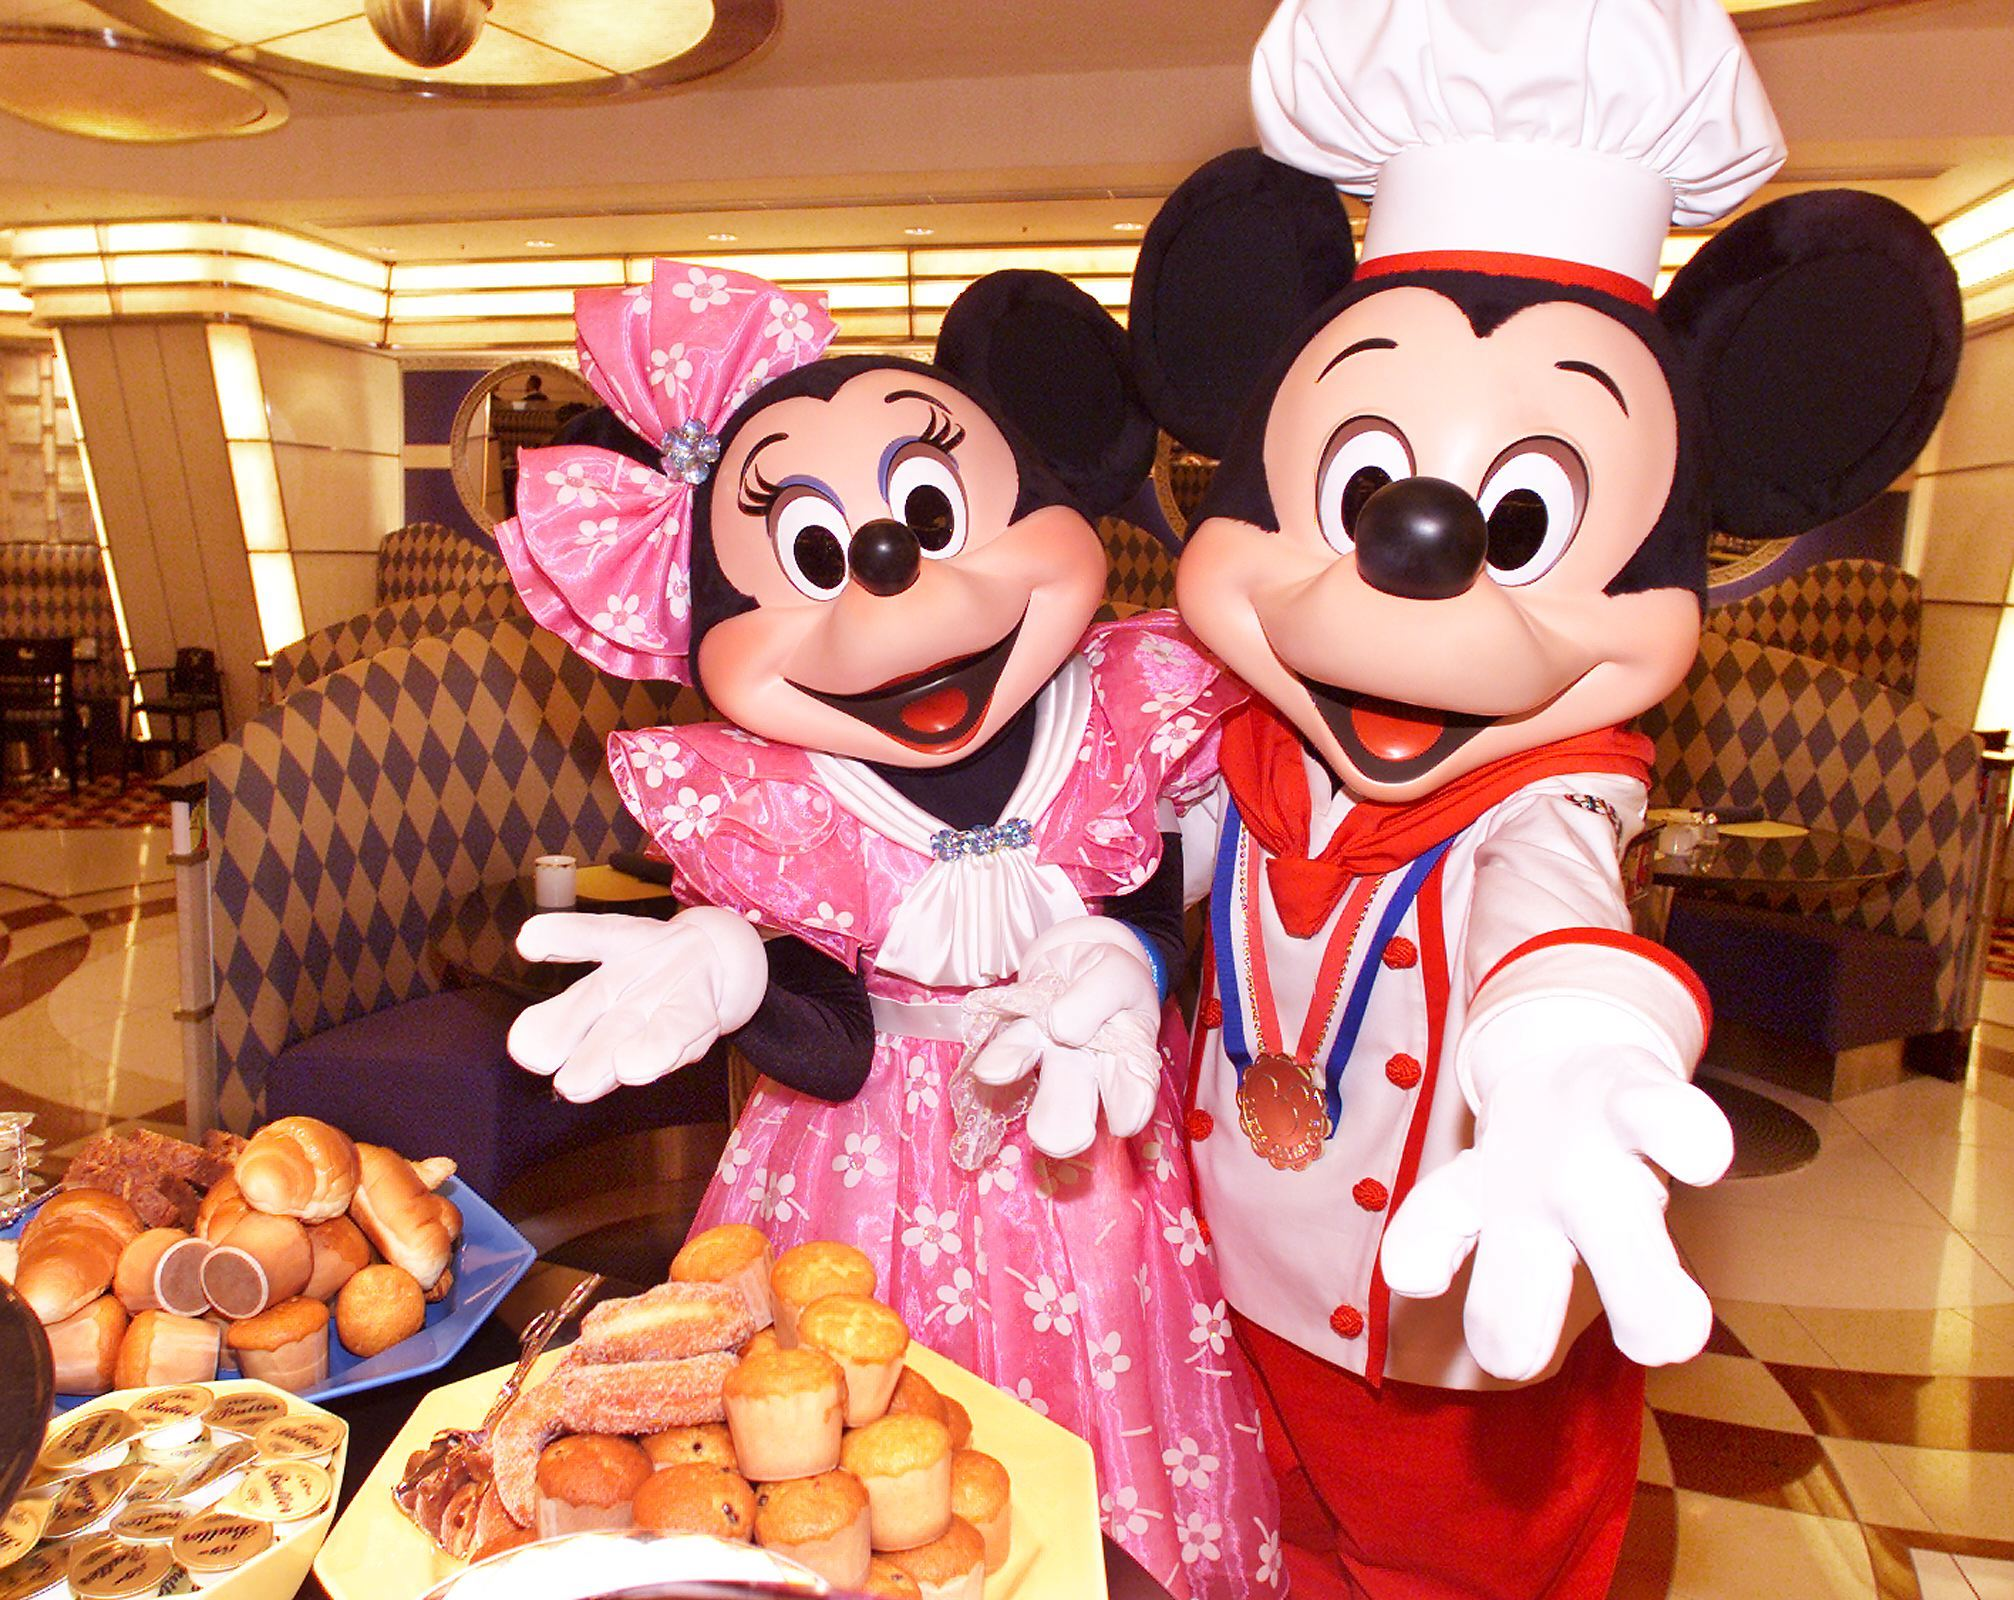 Mickey and Minnie Disneyland